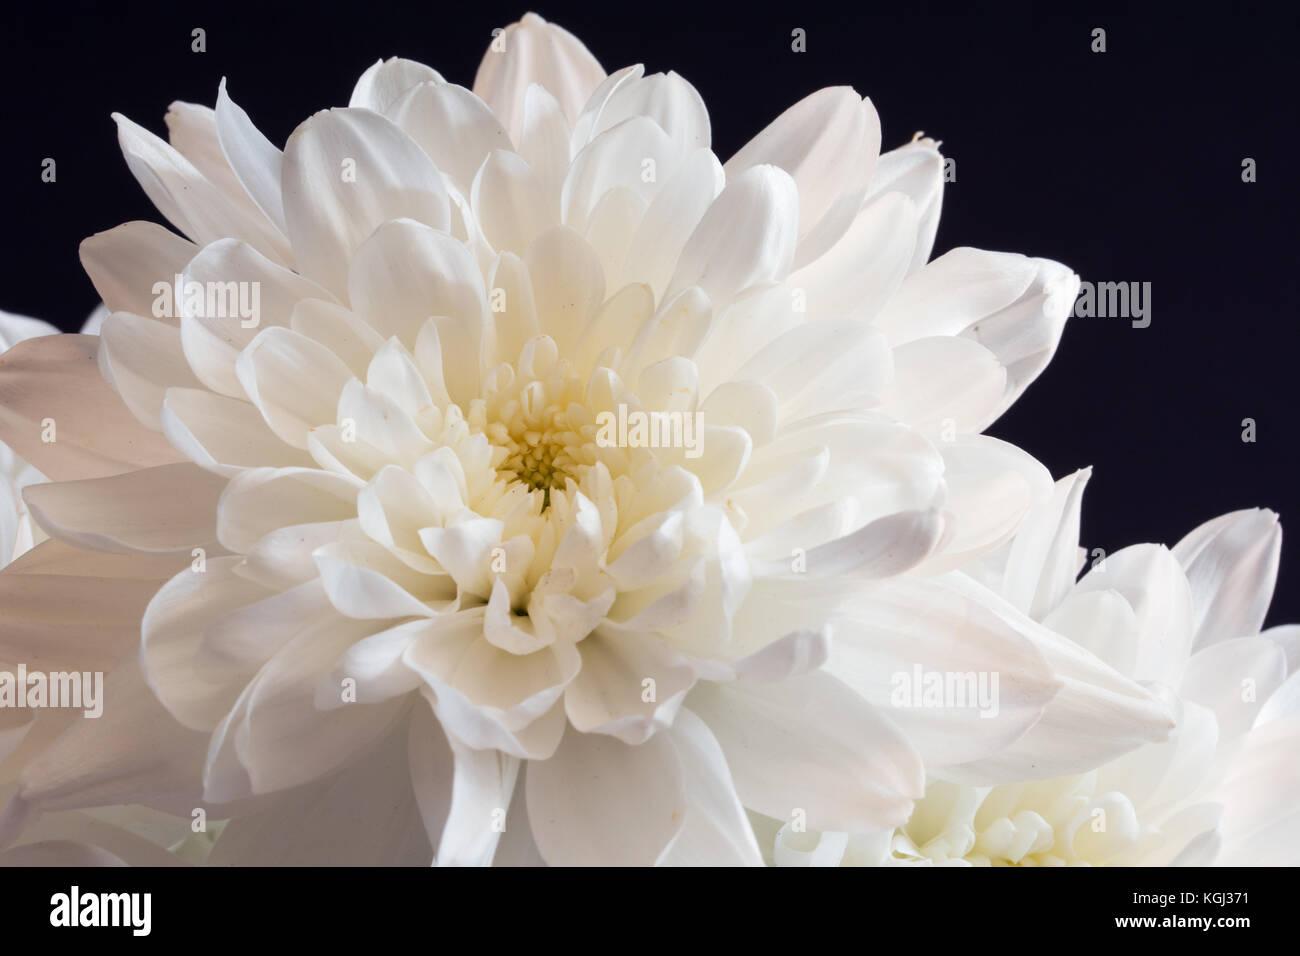 Closeup of white chrysanthemum flower on black background stock closeup of white chrysanthemum flower on black background mightylinksfo